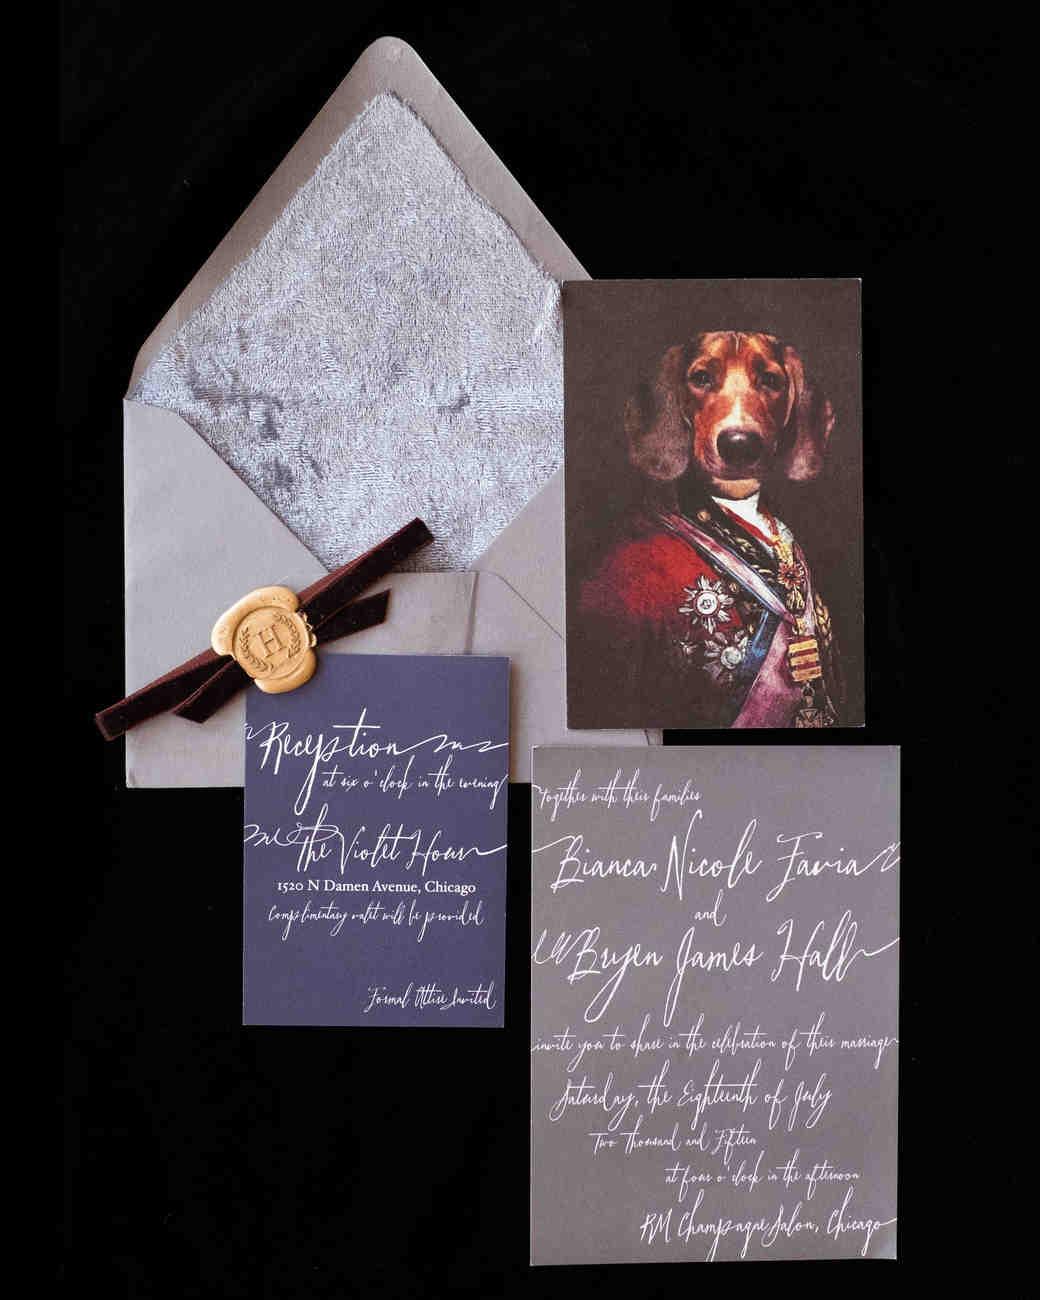 bianca-bryen-wedding-invite-2-s112509-0216.jpg